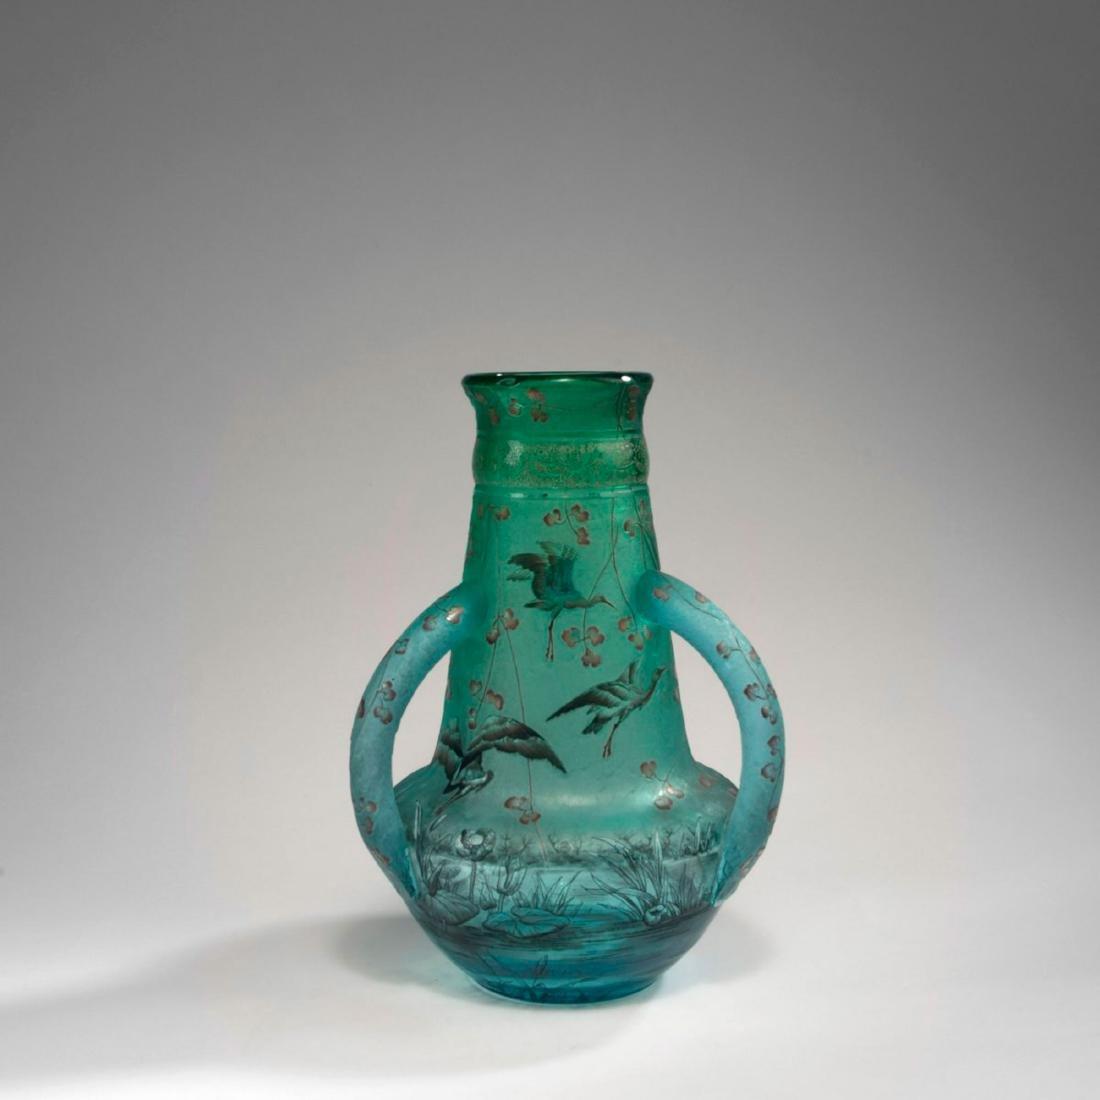 'Cigognes' vase with handles, 1895